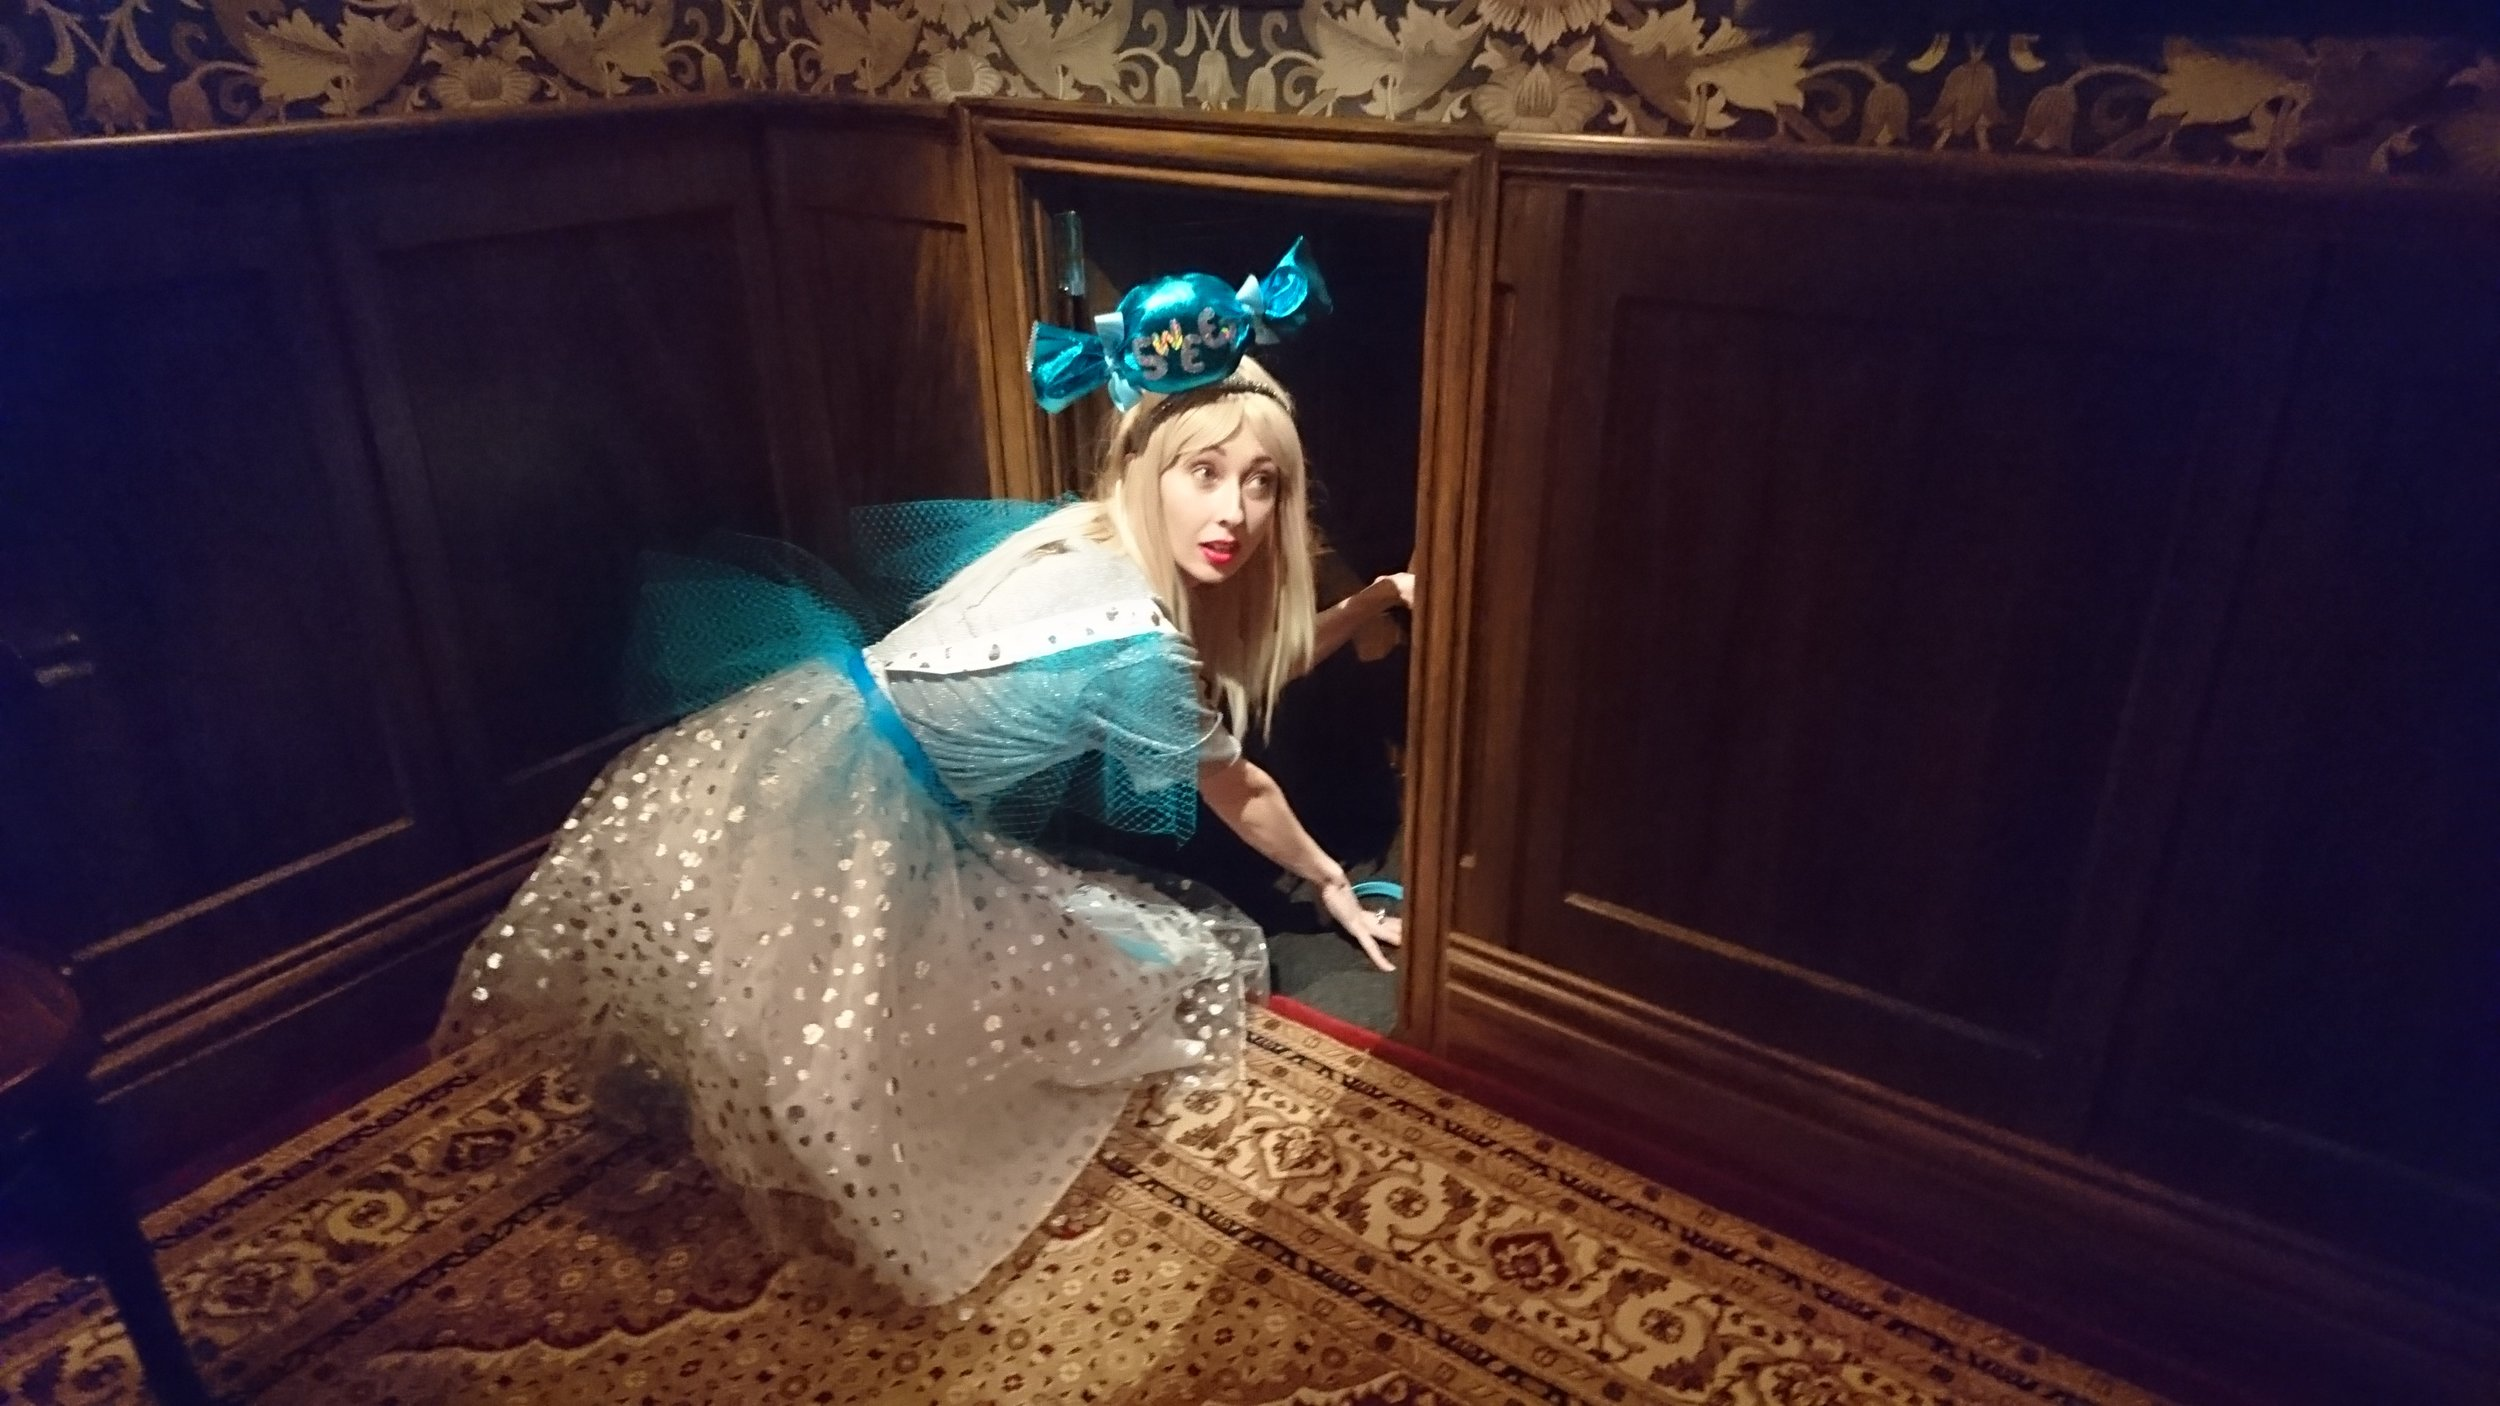 Costume - Kristine Walker - The Human Chameleon - ACMI - Alice in Wonderland (1).JPG